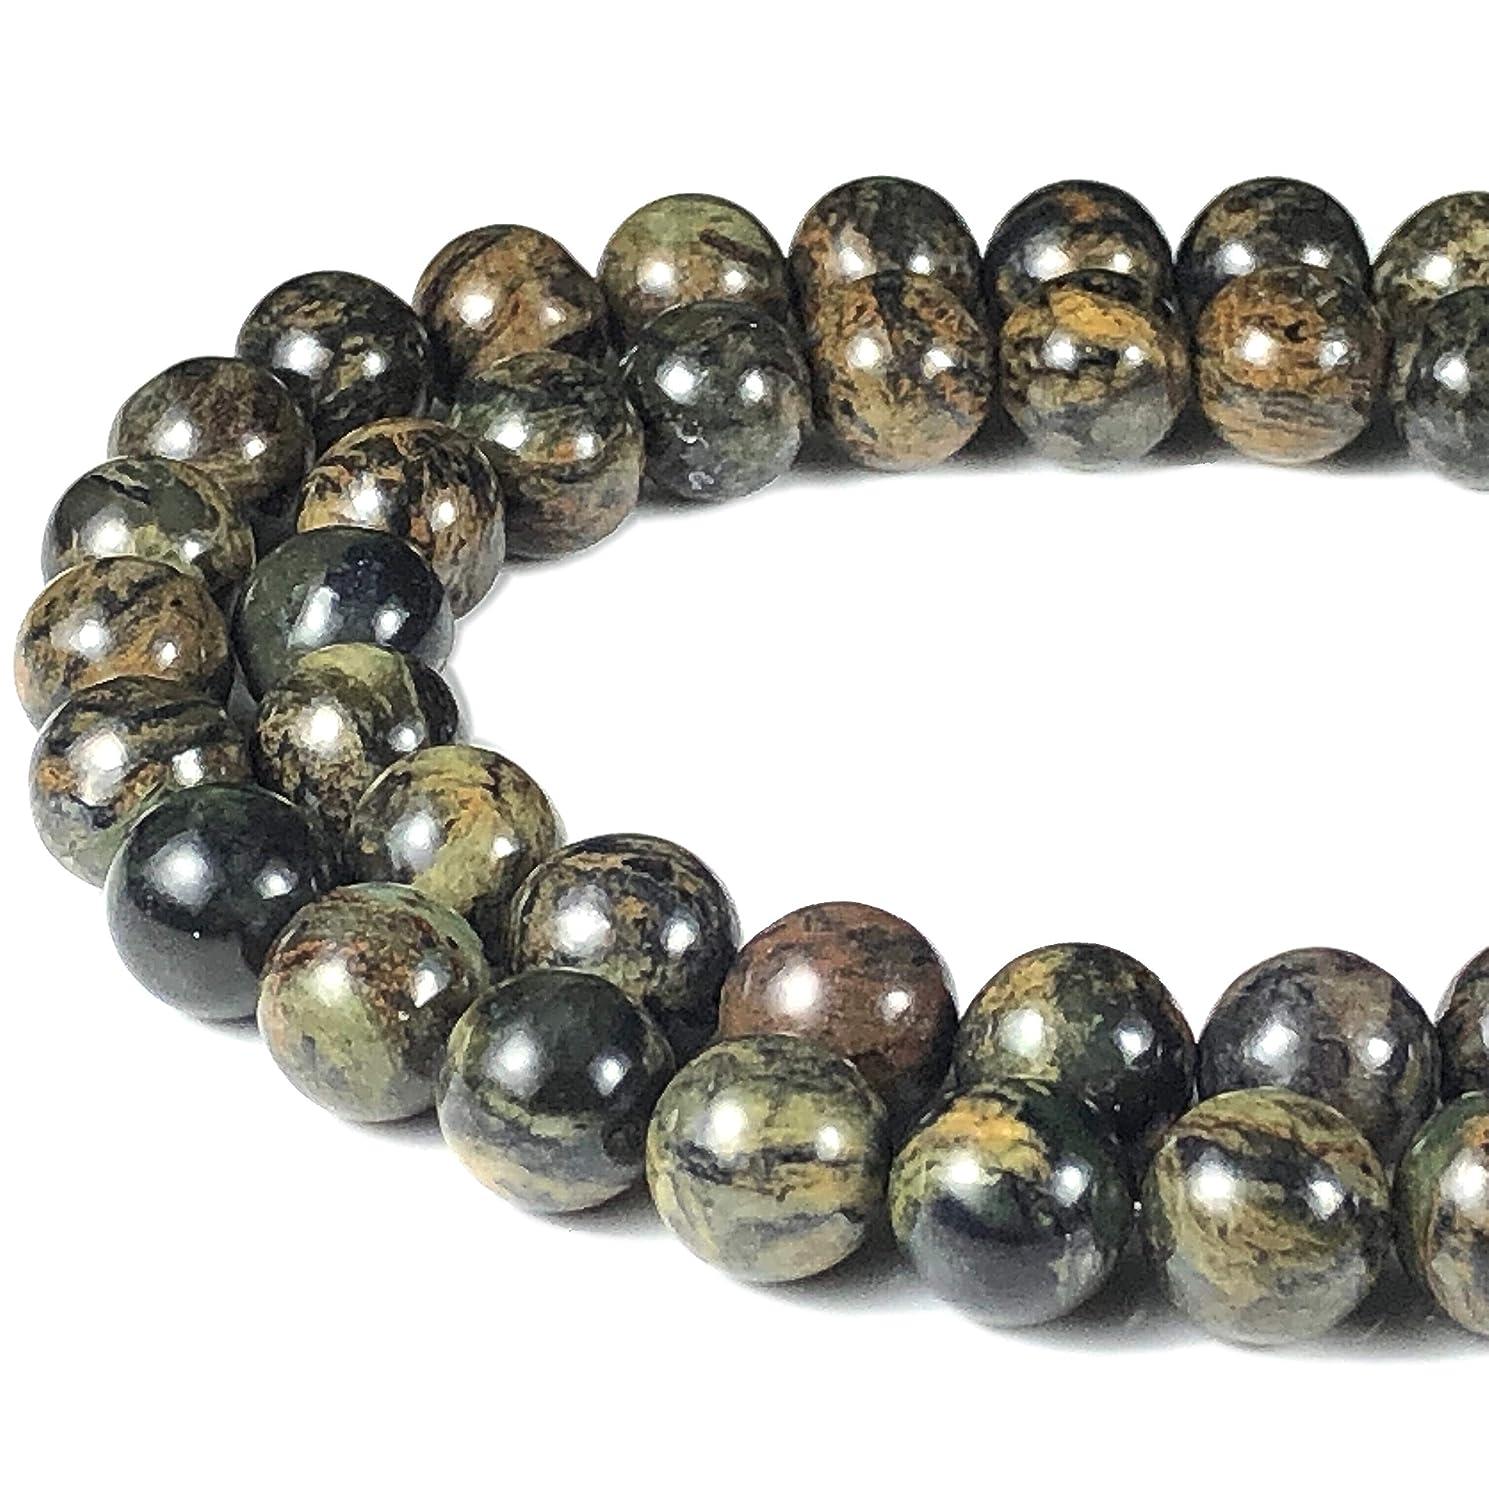 [ABCgems] Orange Dendritic Jade 8mm Smooth Round Beads for Beading & Jewelry Making